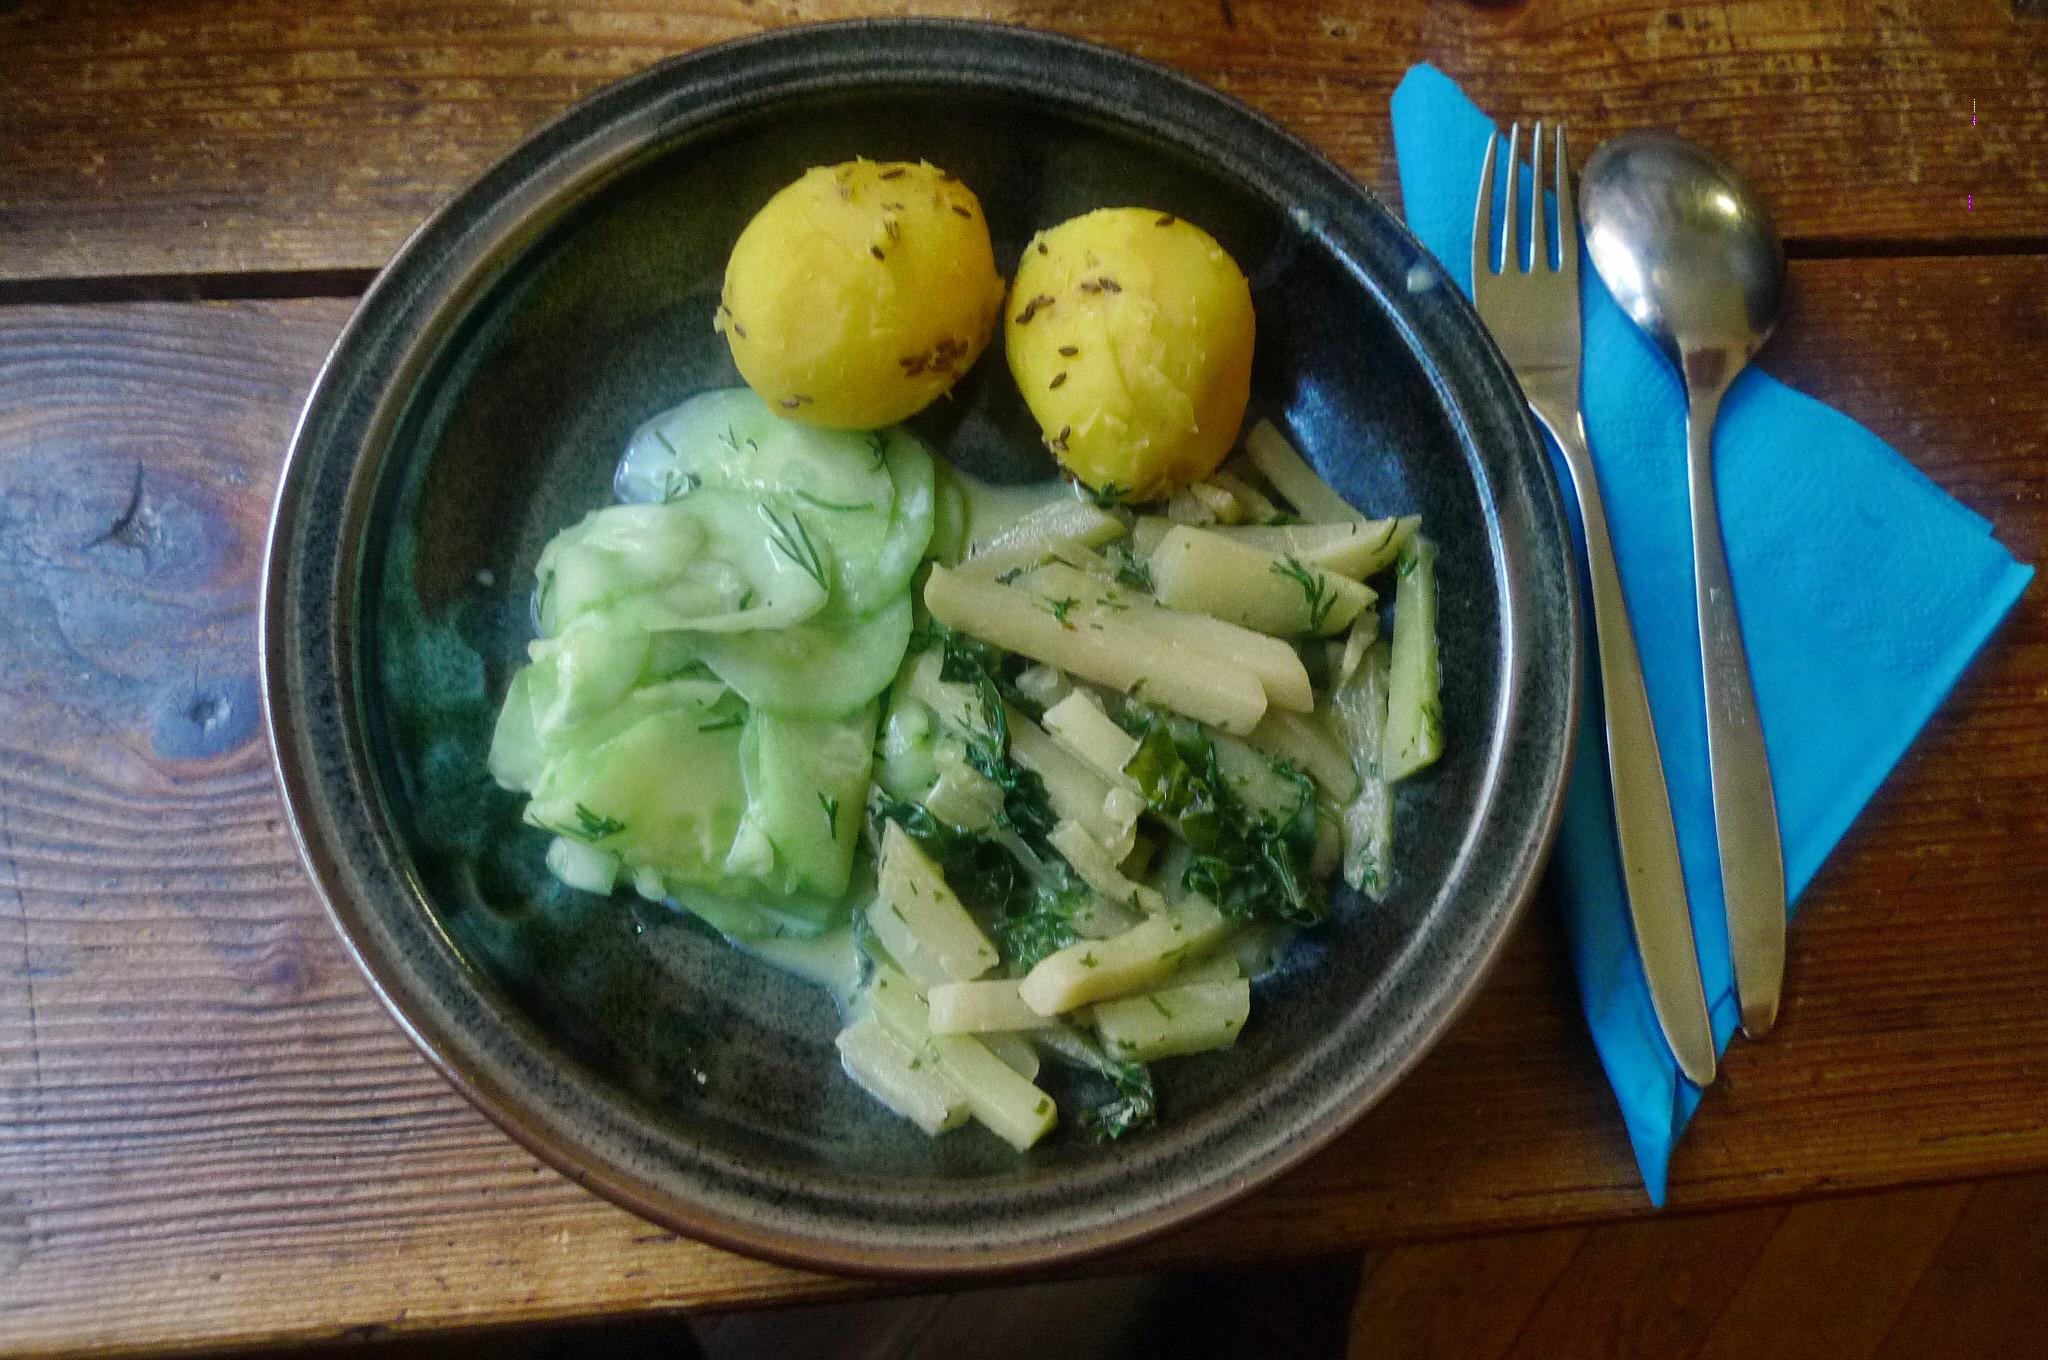 Selleriegemüse,Gurkensalat,Kartoffeln,Quarkspreise-19.3.15   (11)